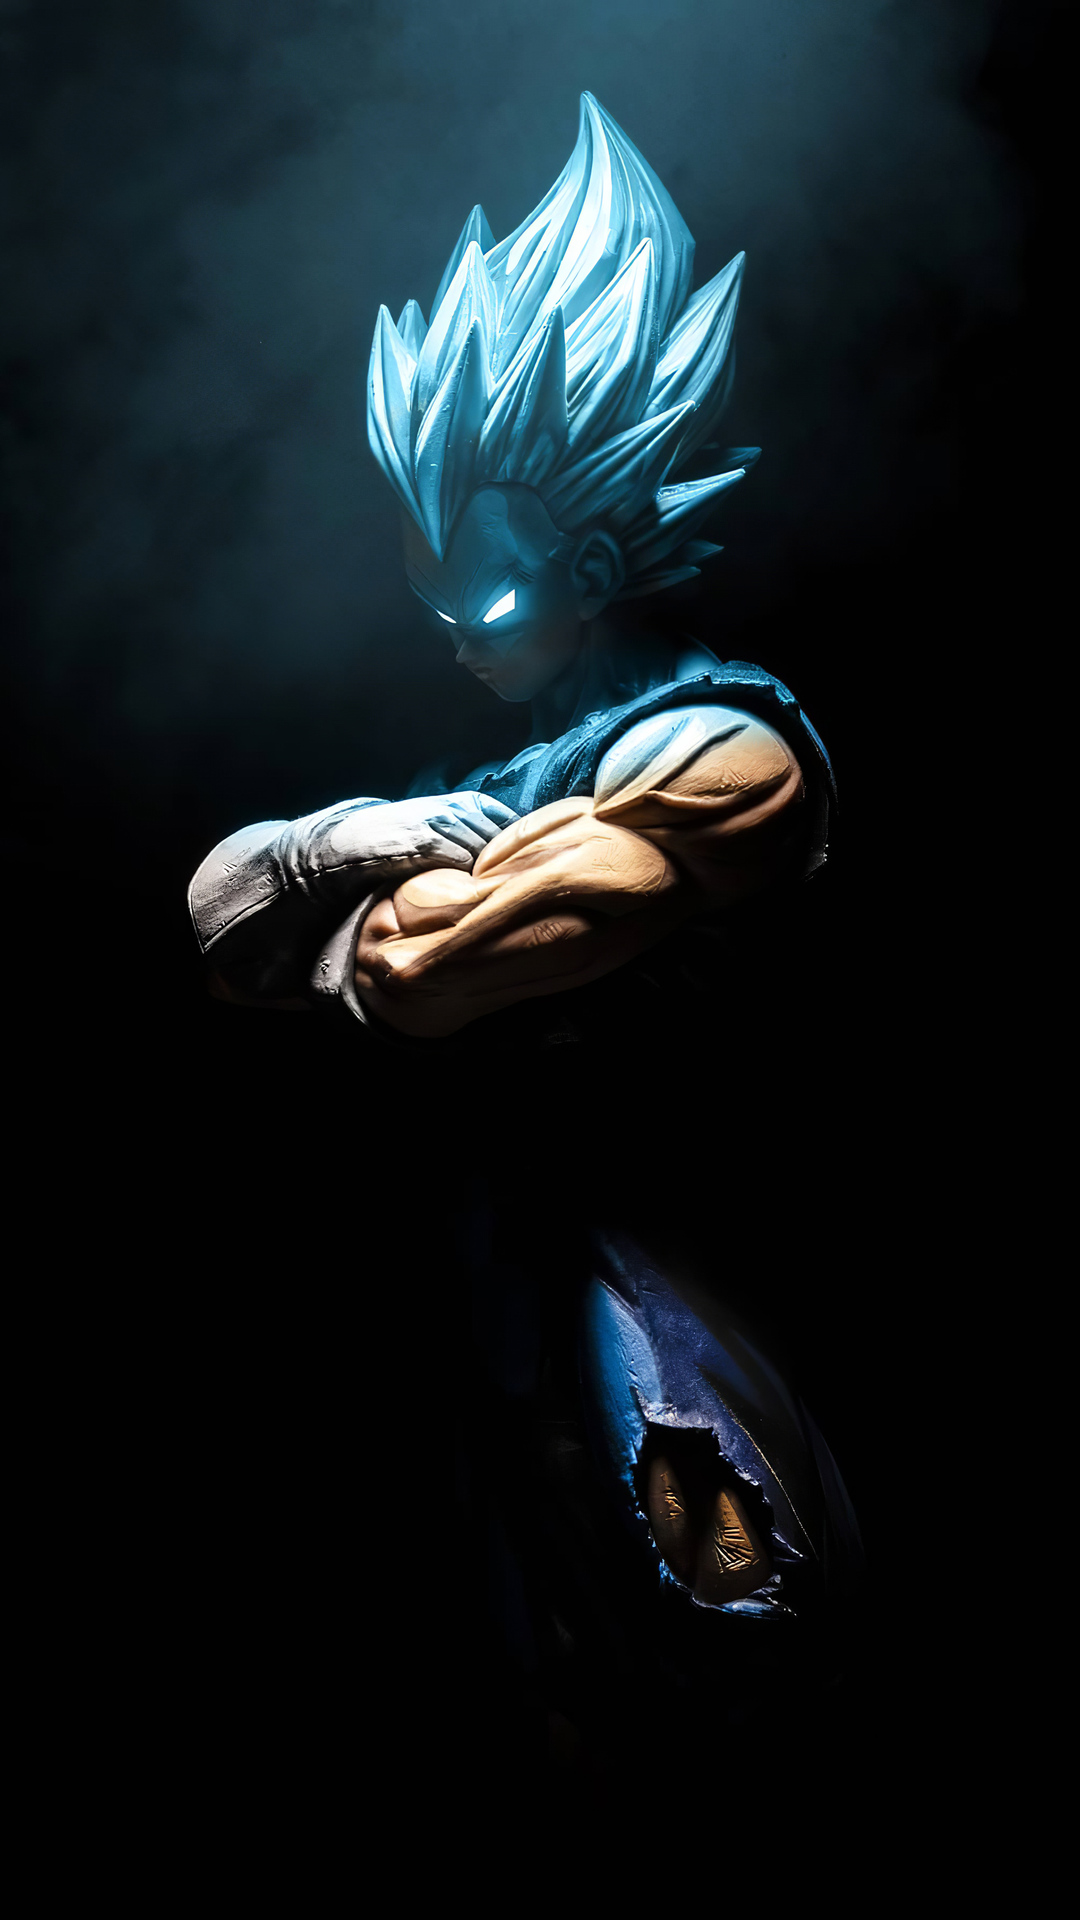 Wallpaper Goku Sayajin Anime Hd 4k